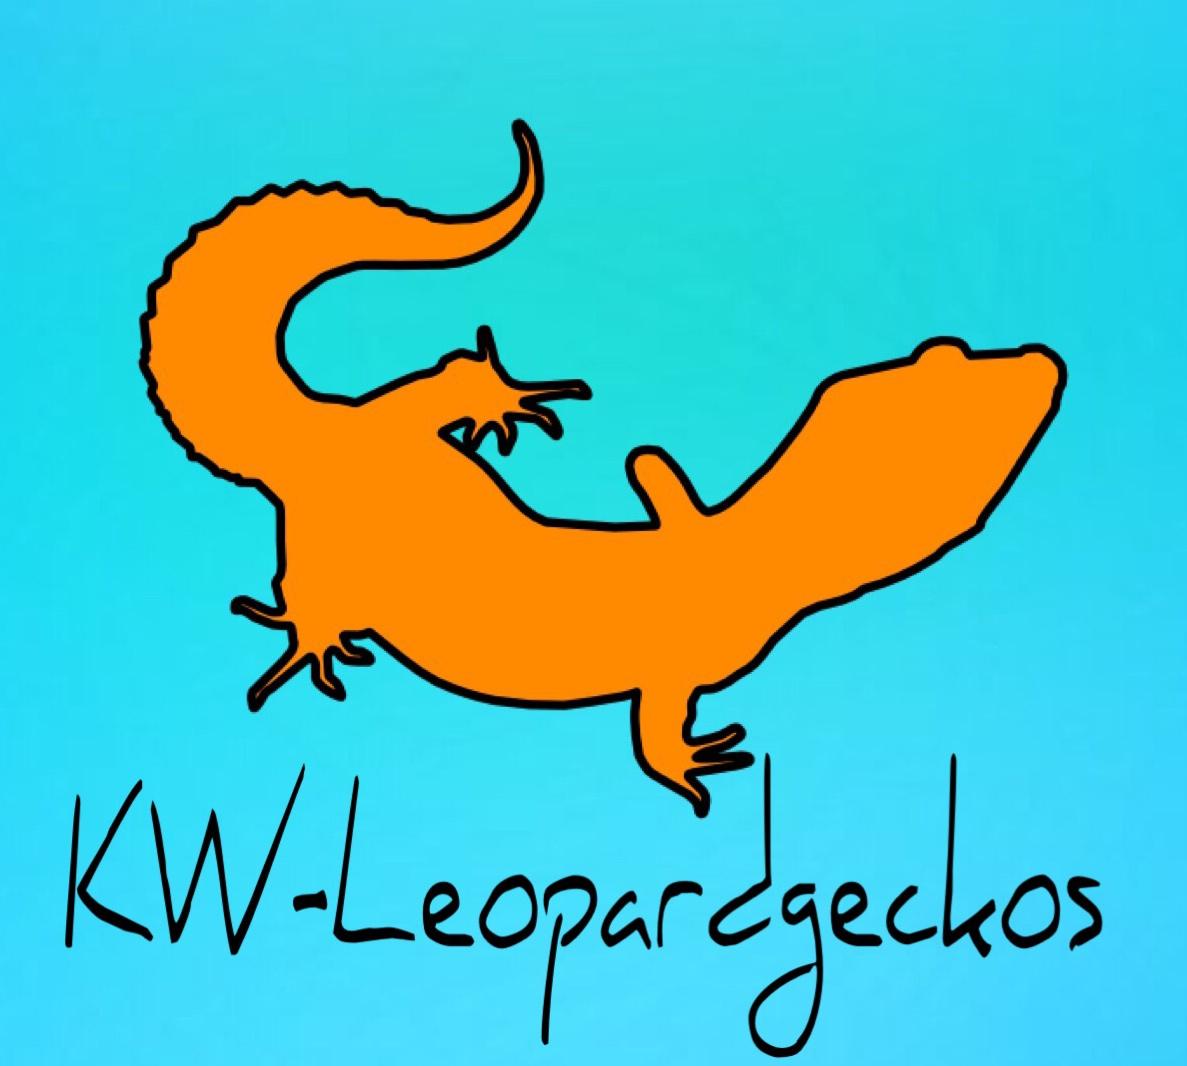 Kettwiger Leopardgeckos